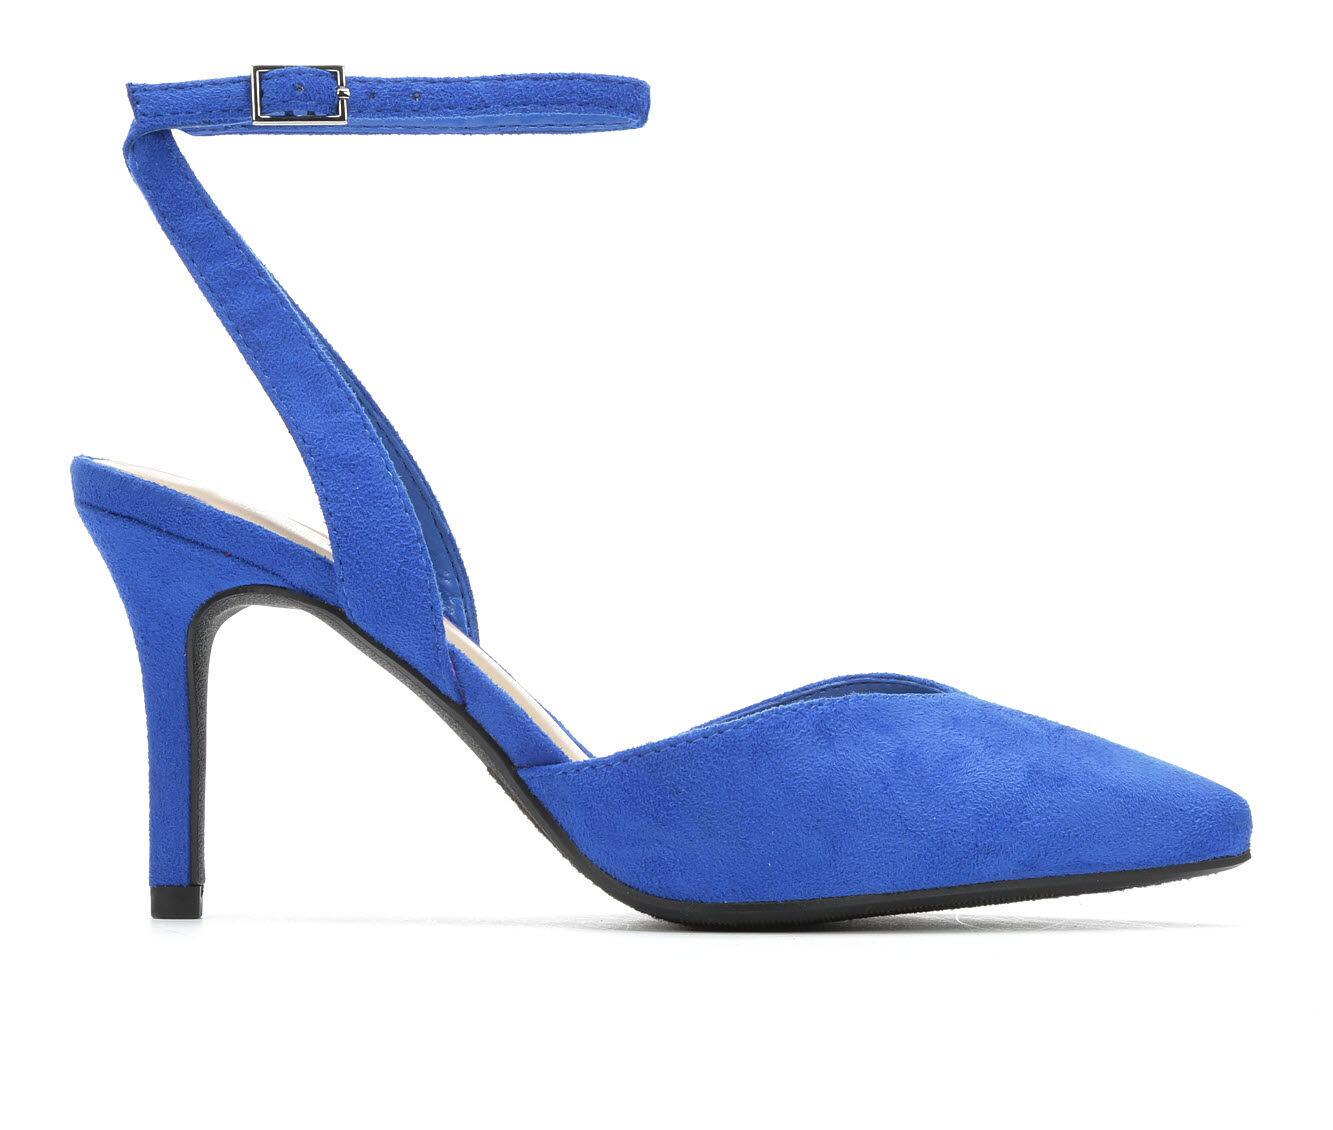 Economic popular Women's Y-Not Mary Jane Pumps New Royal Blue